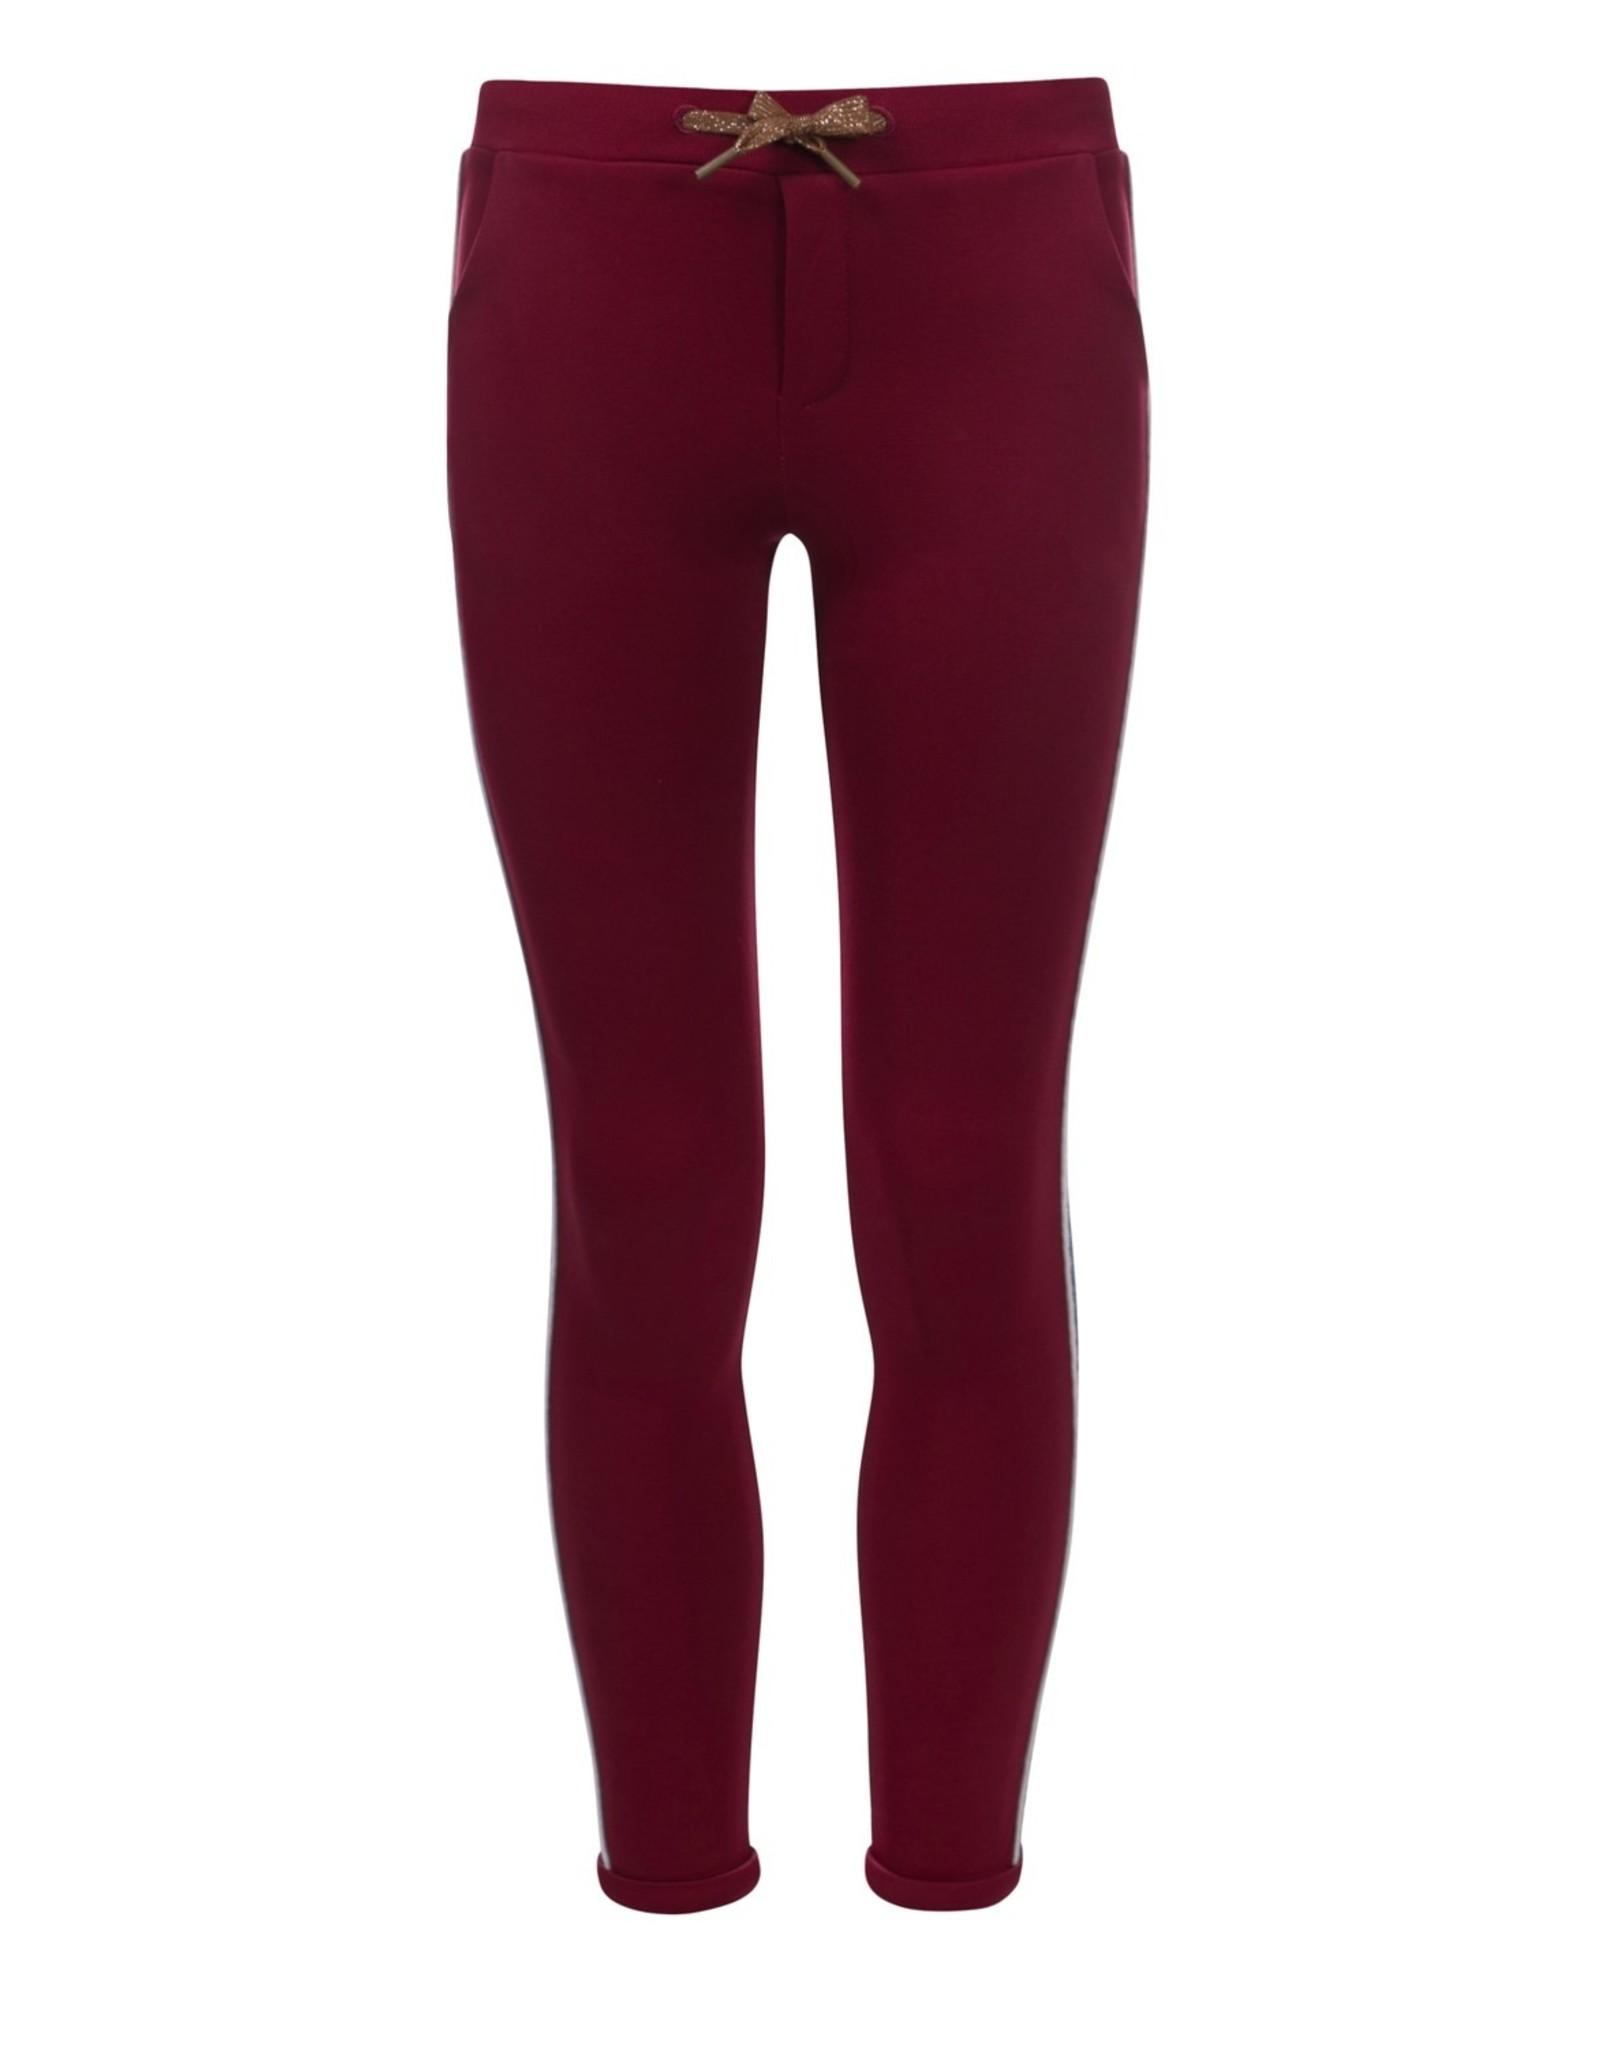 Looxs Revolution Girls Sweat pants